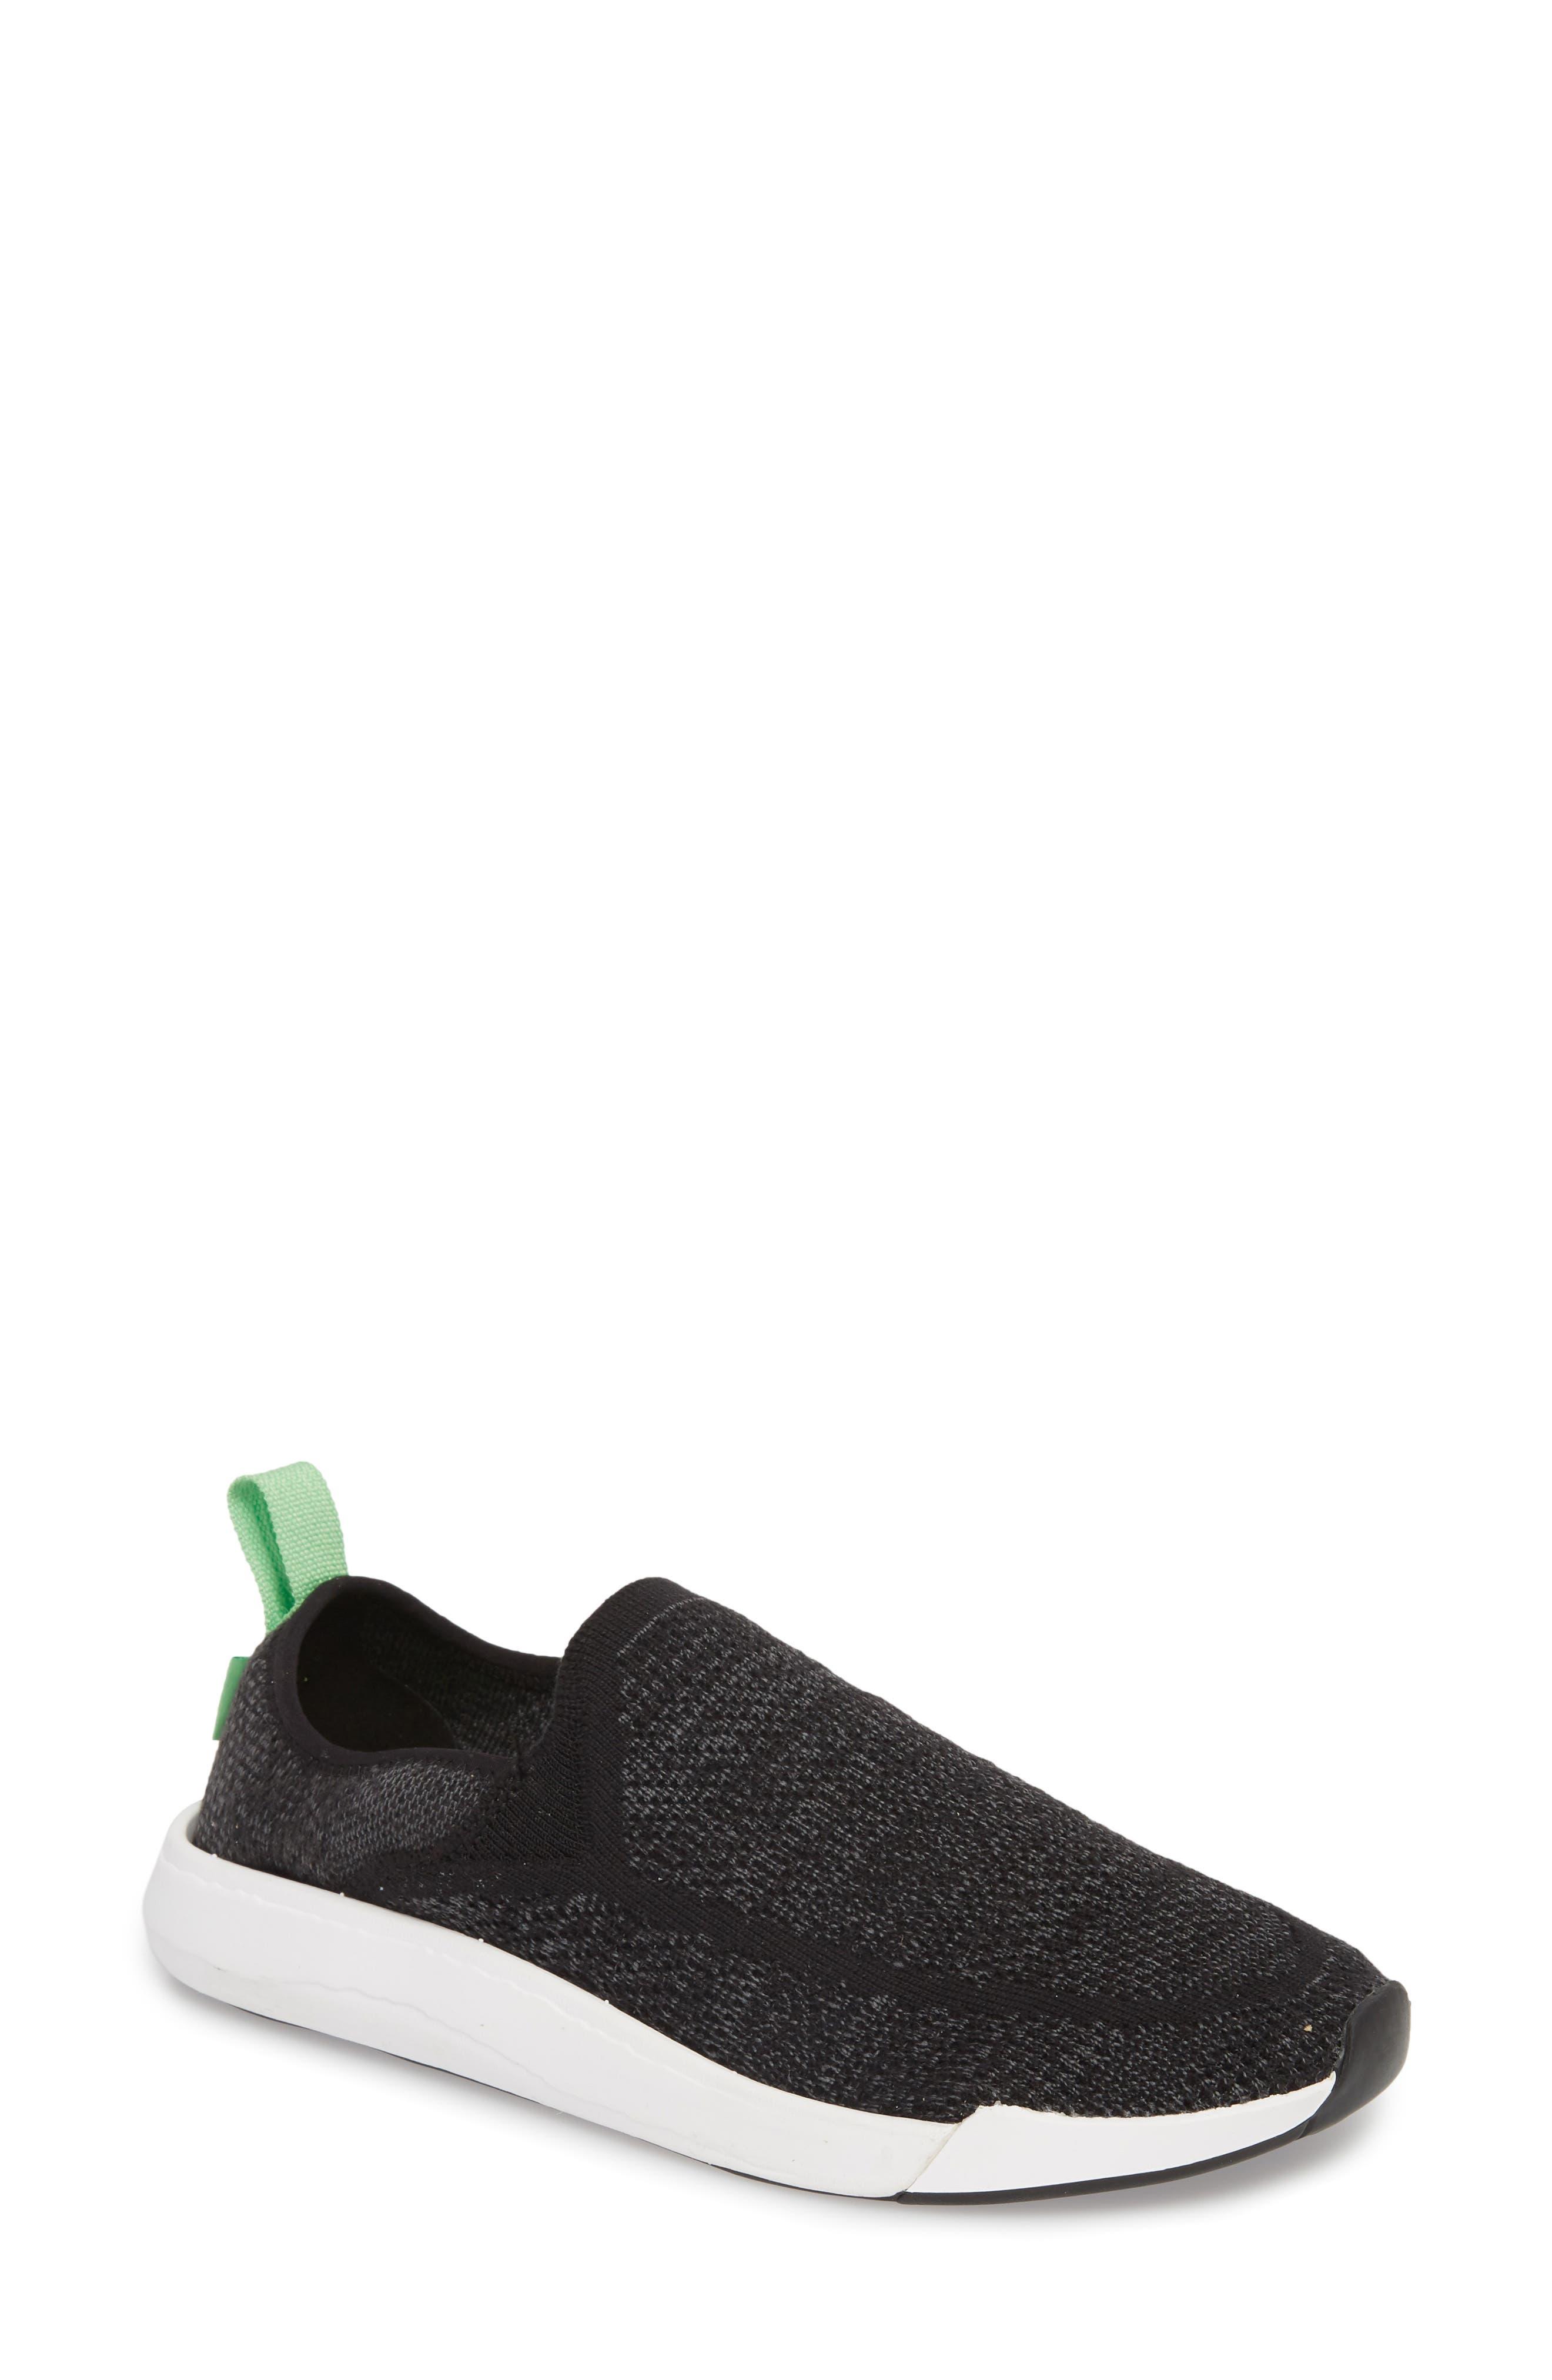 Chiba Quest Knit Slip-On Sneaker,                         Main,                         color, Black